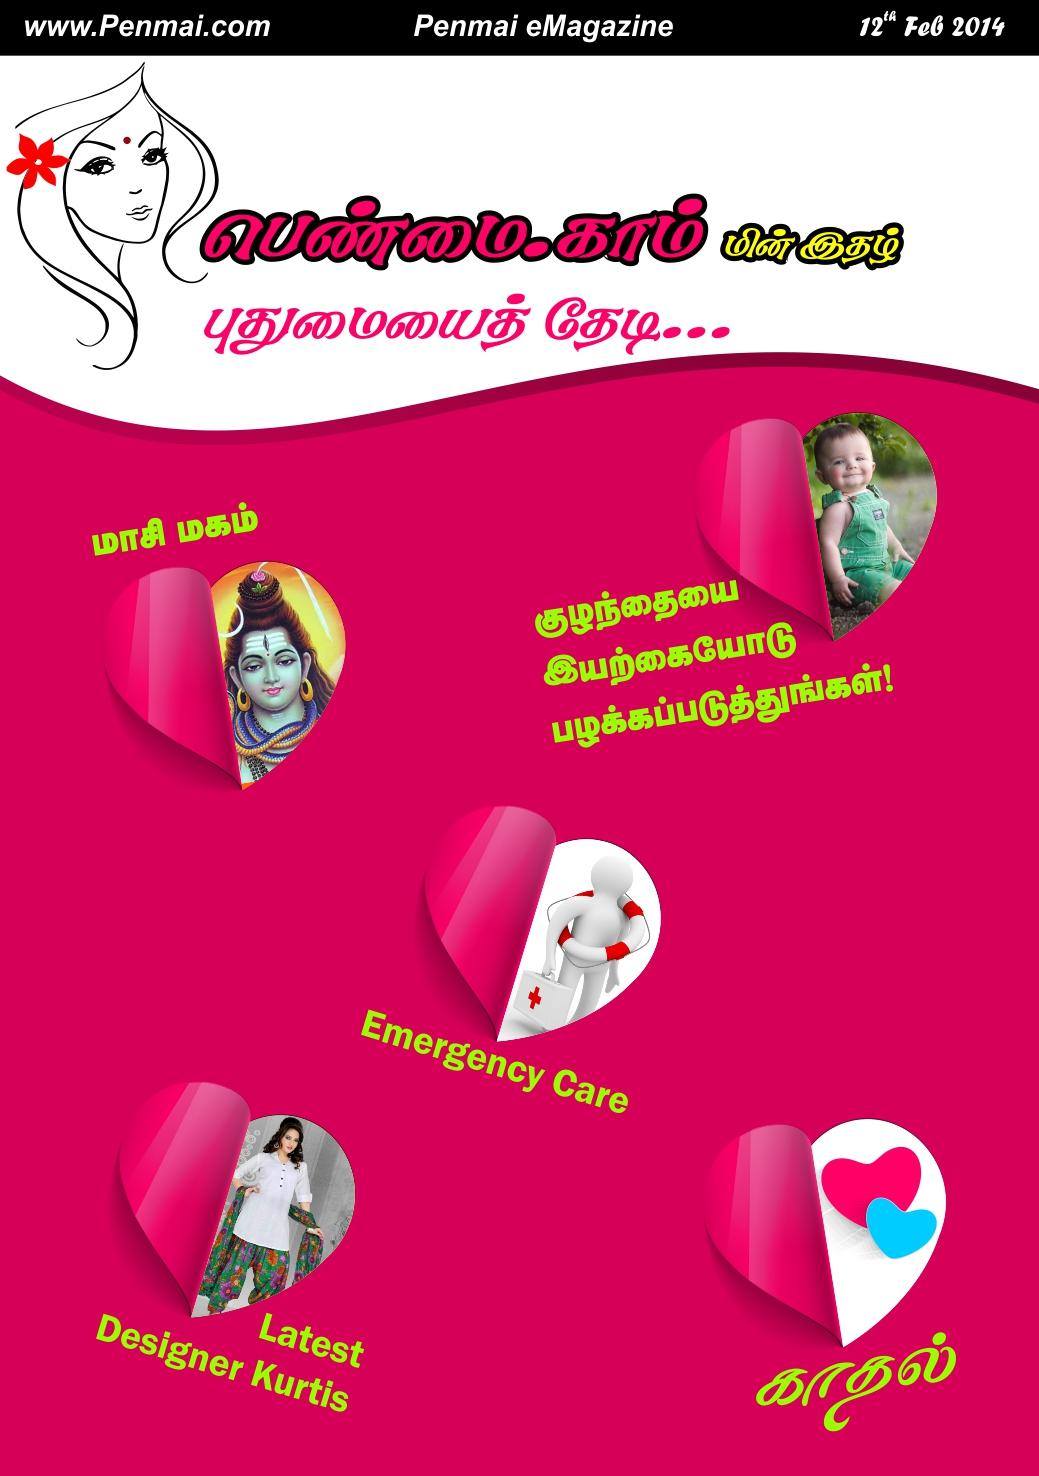 Name:  Penmai eMagazine Feb 2014.jpg Views: 1358 Size:  390.2 KB